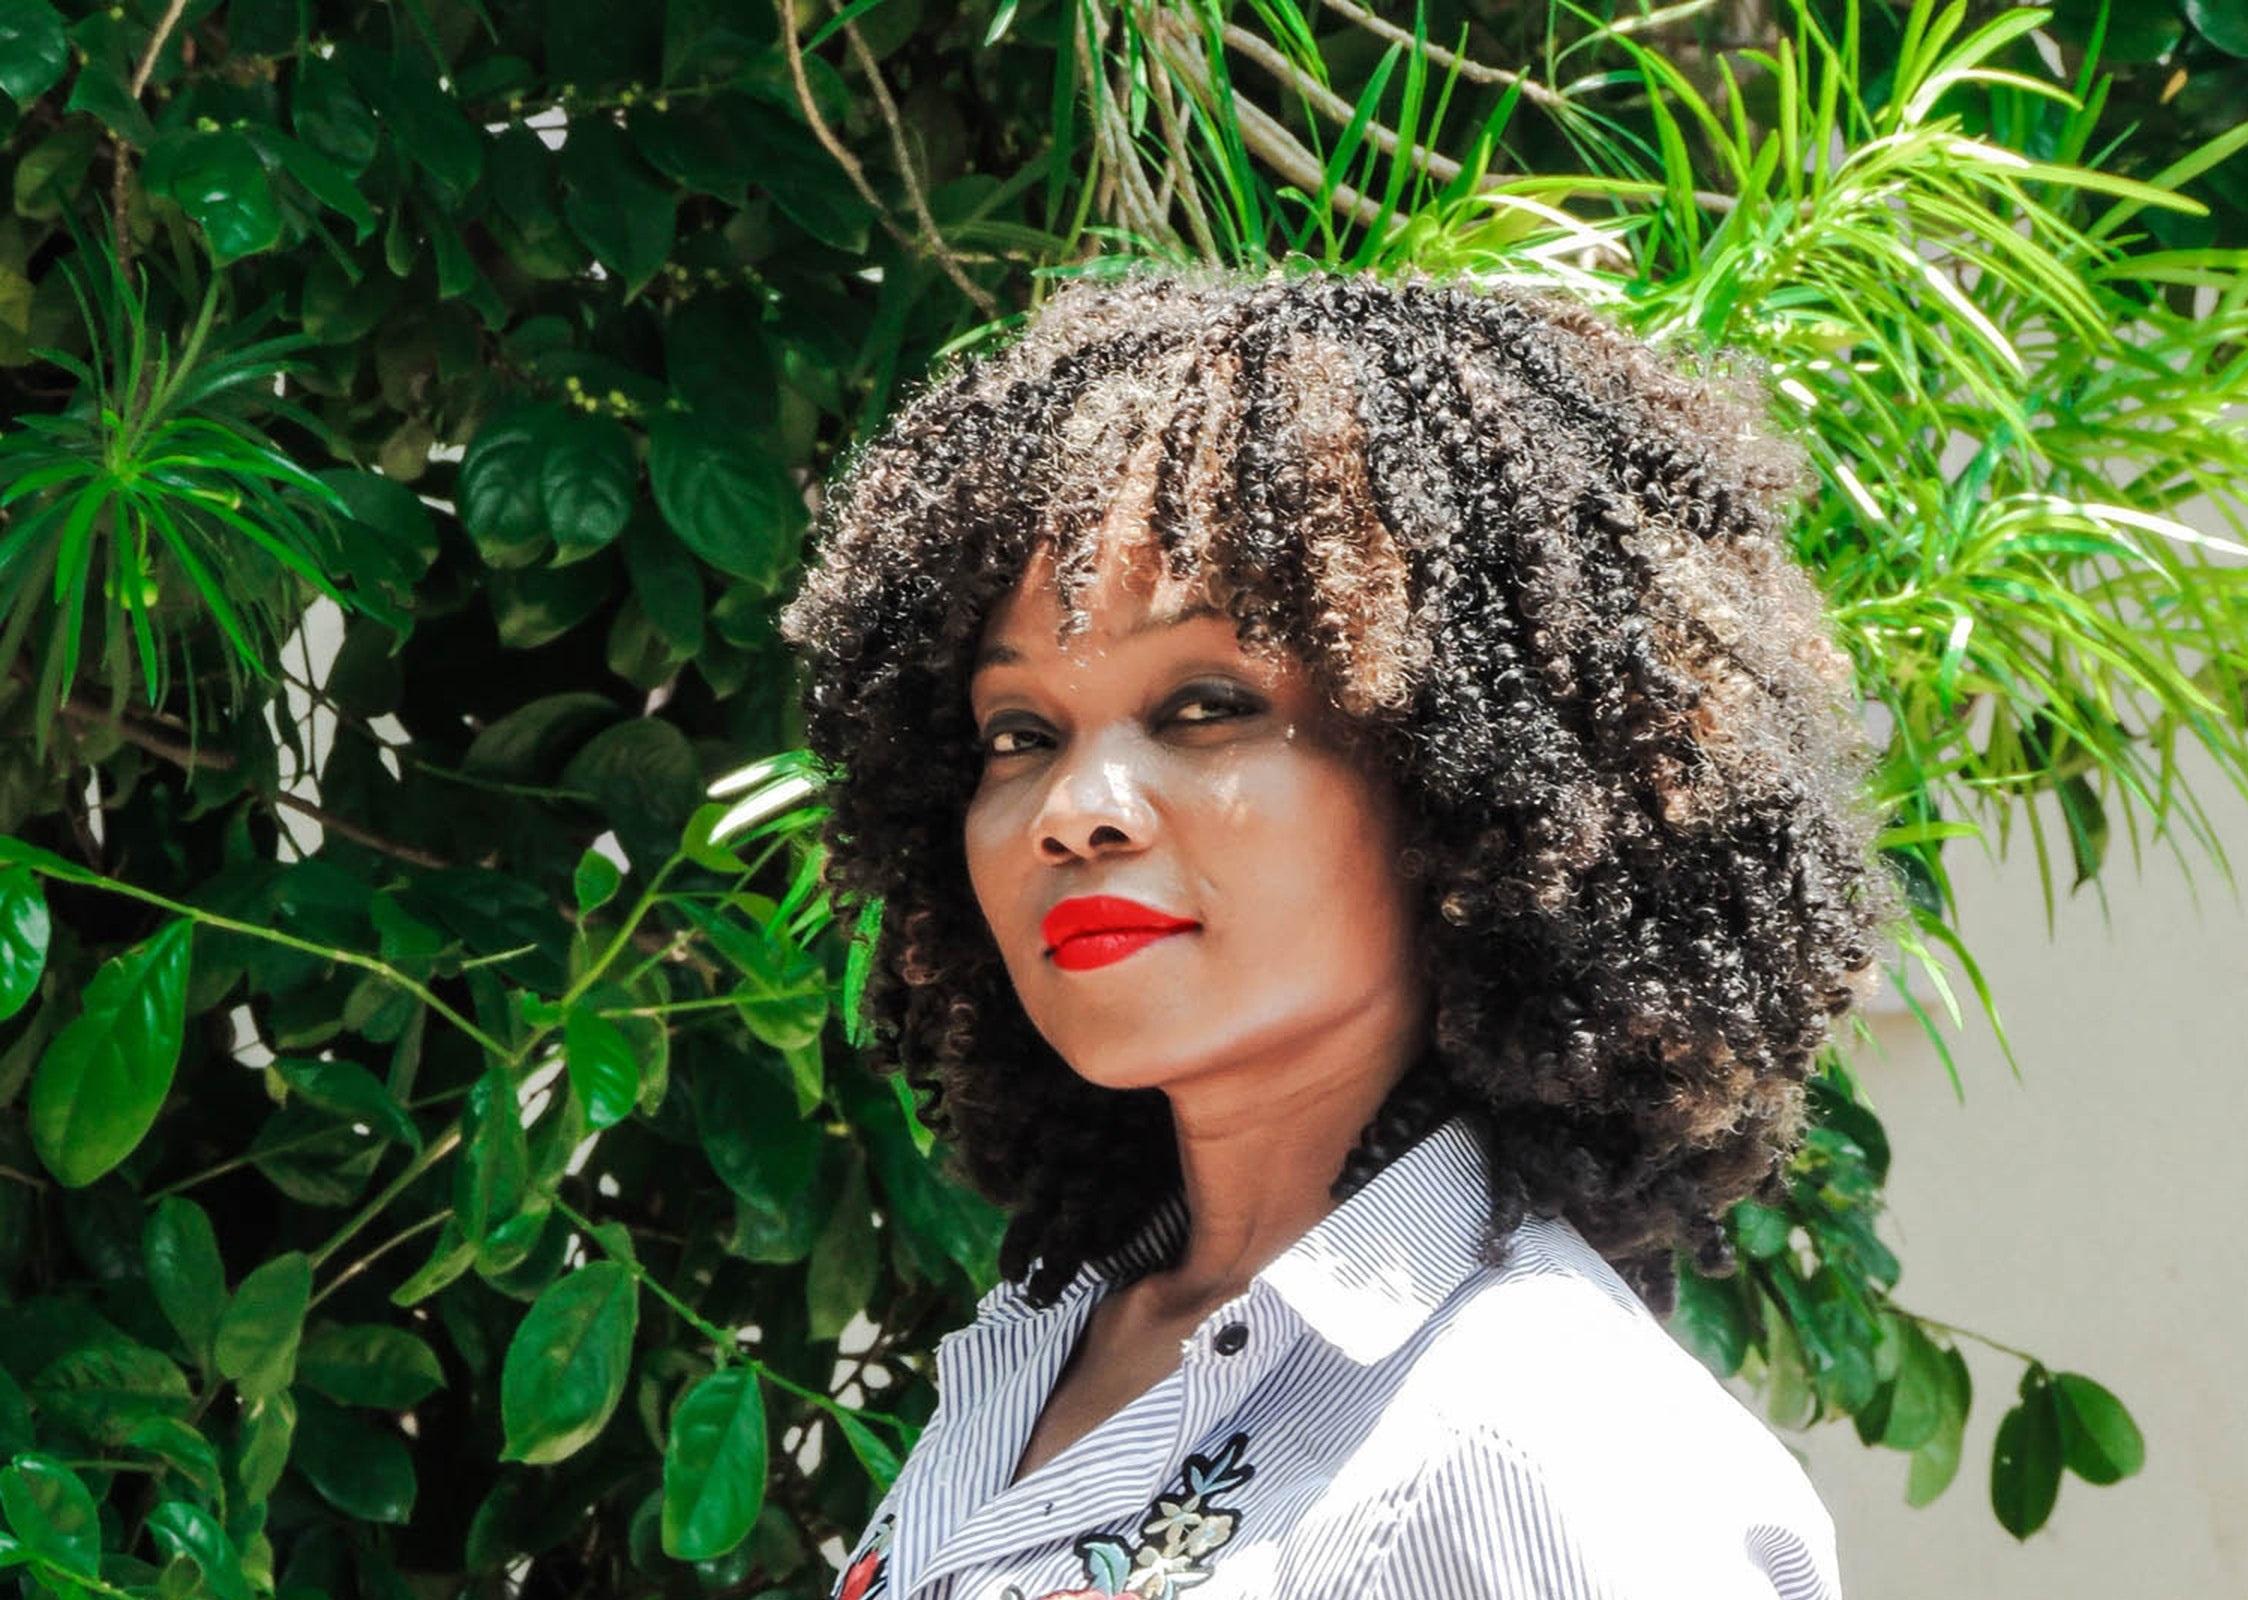 Cortes de cabelo feminino médio: dicas e ideias para todo tipo de fio